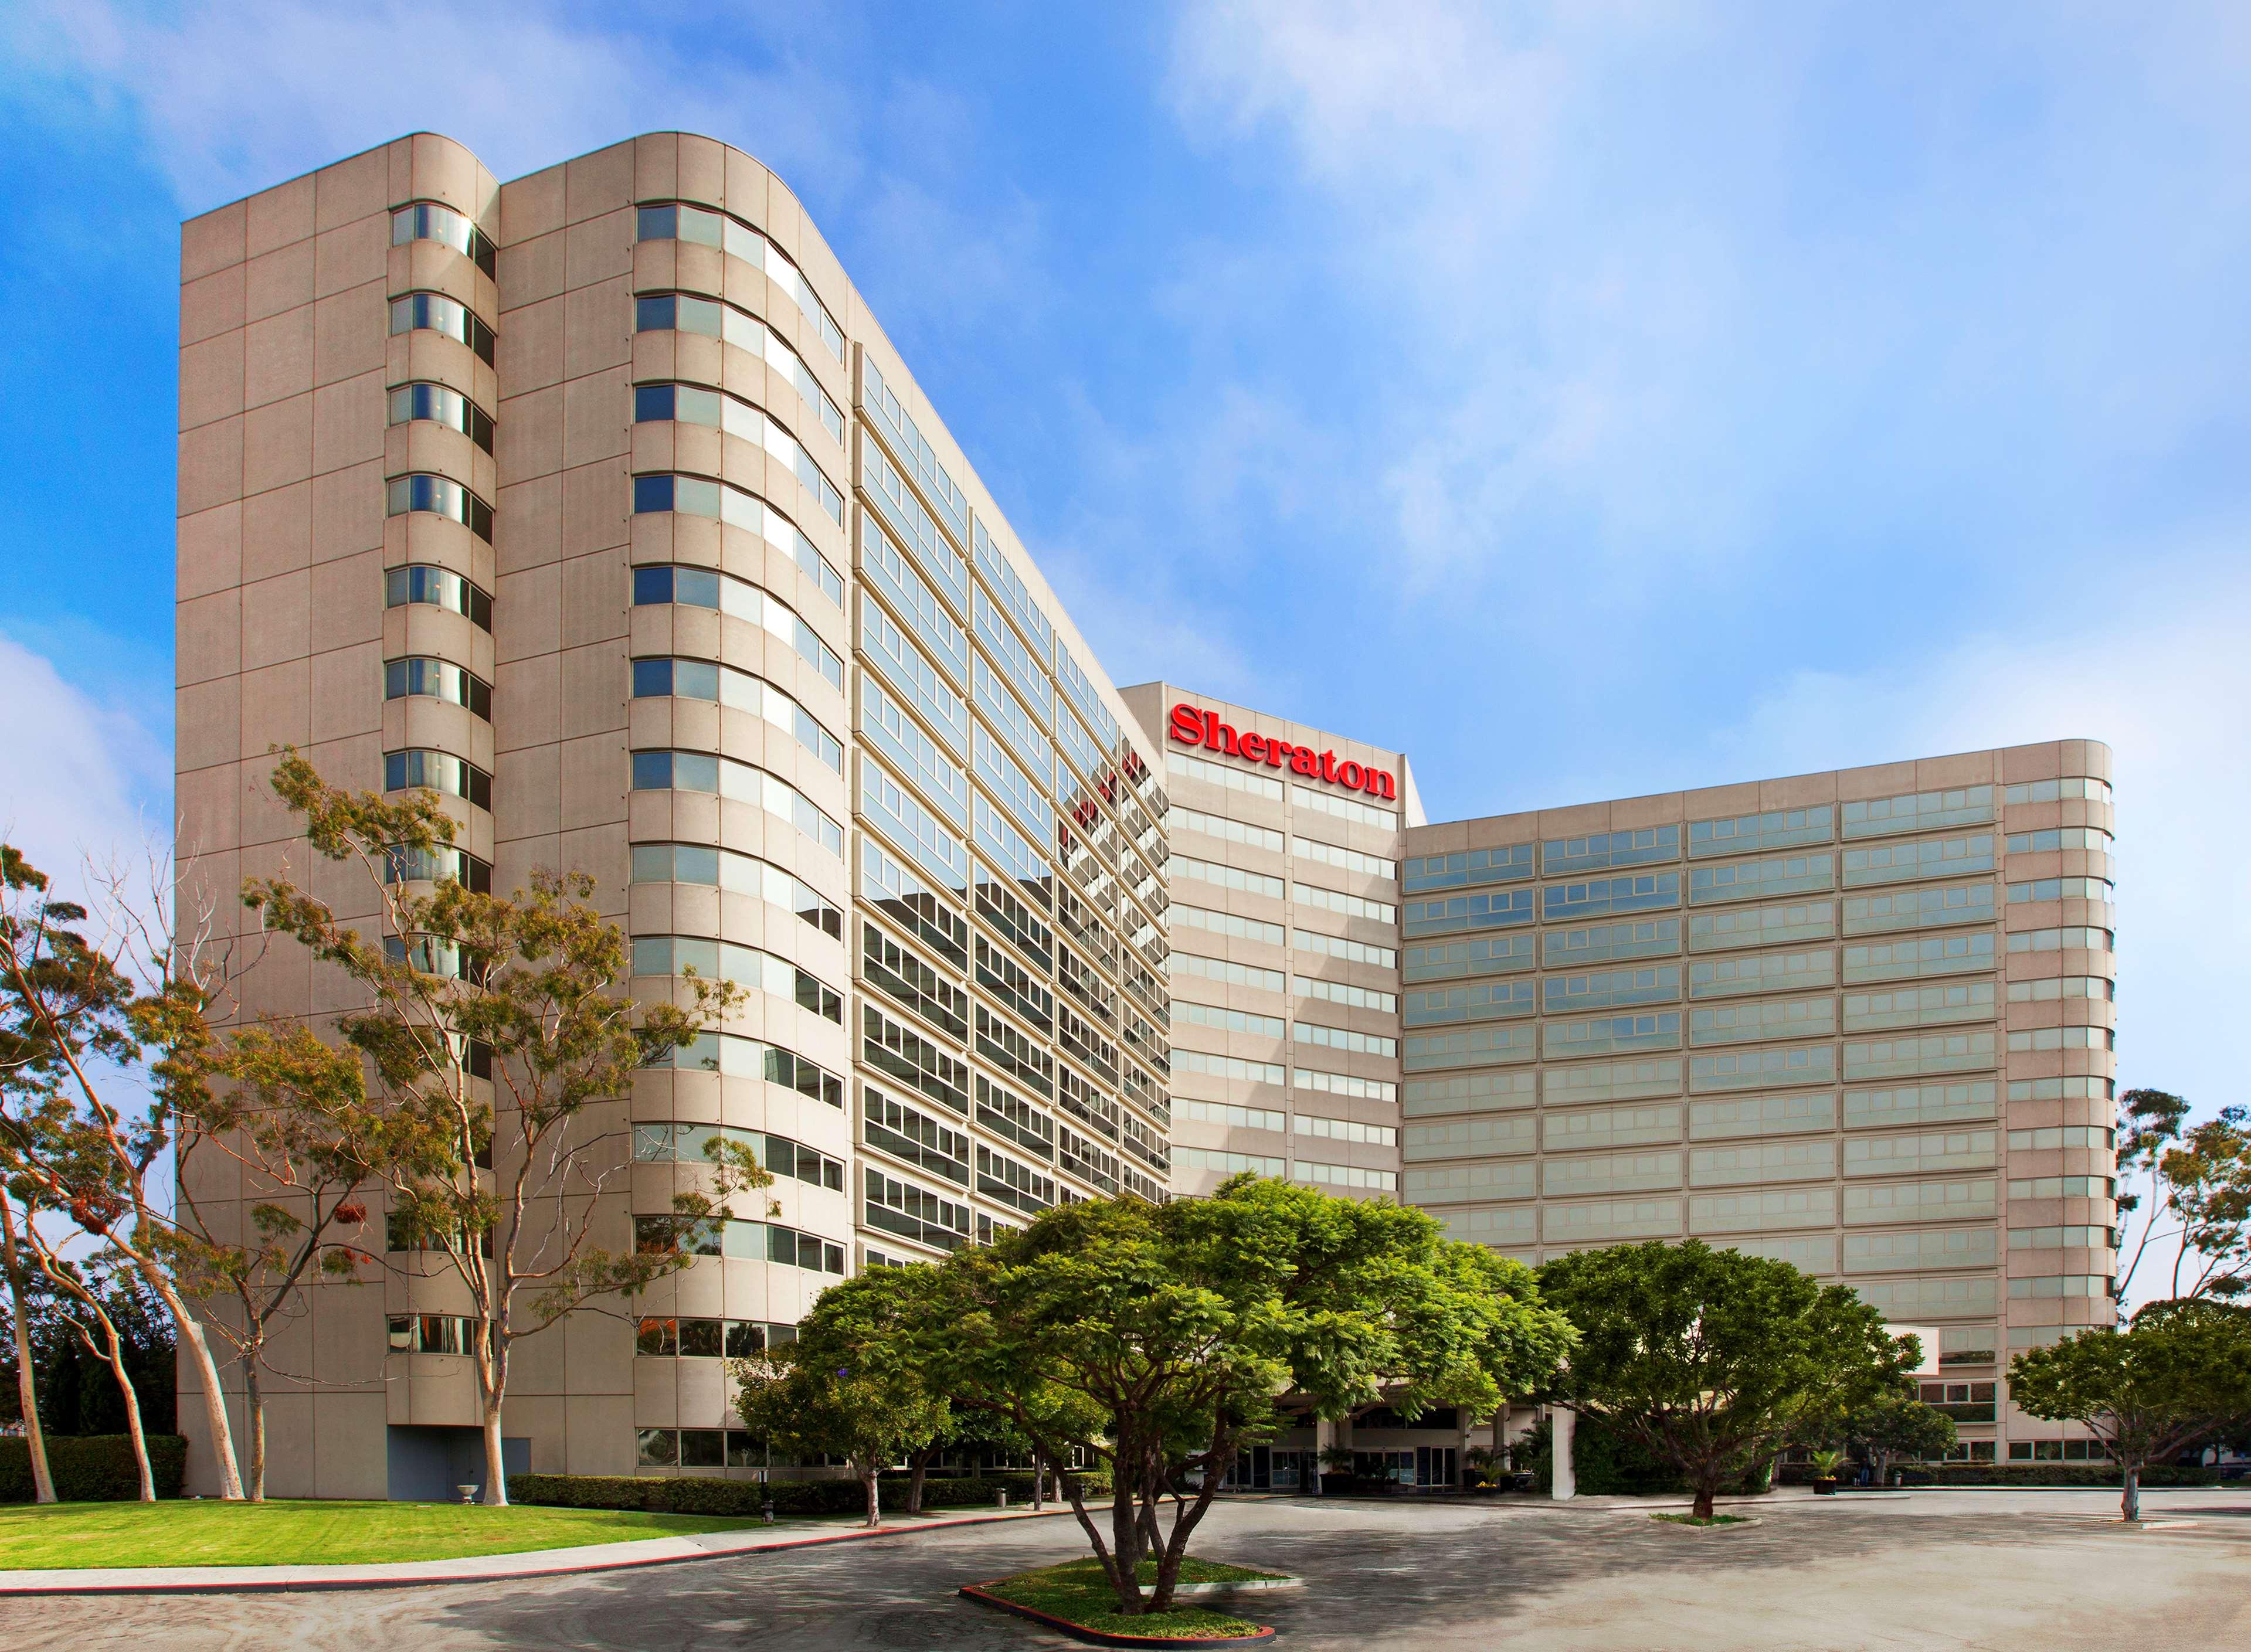 Sheraton Gateway Los Angeles Hotel image 0